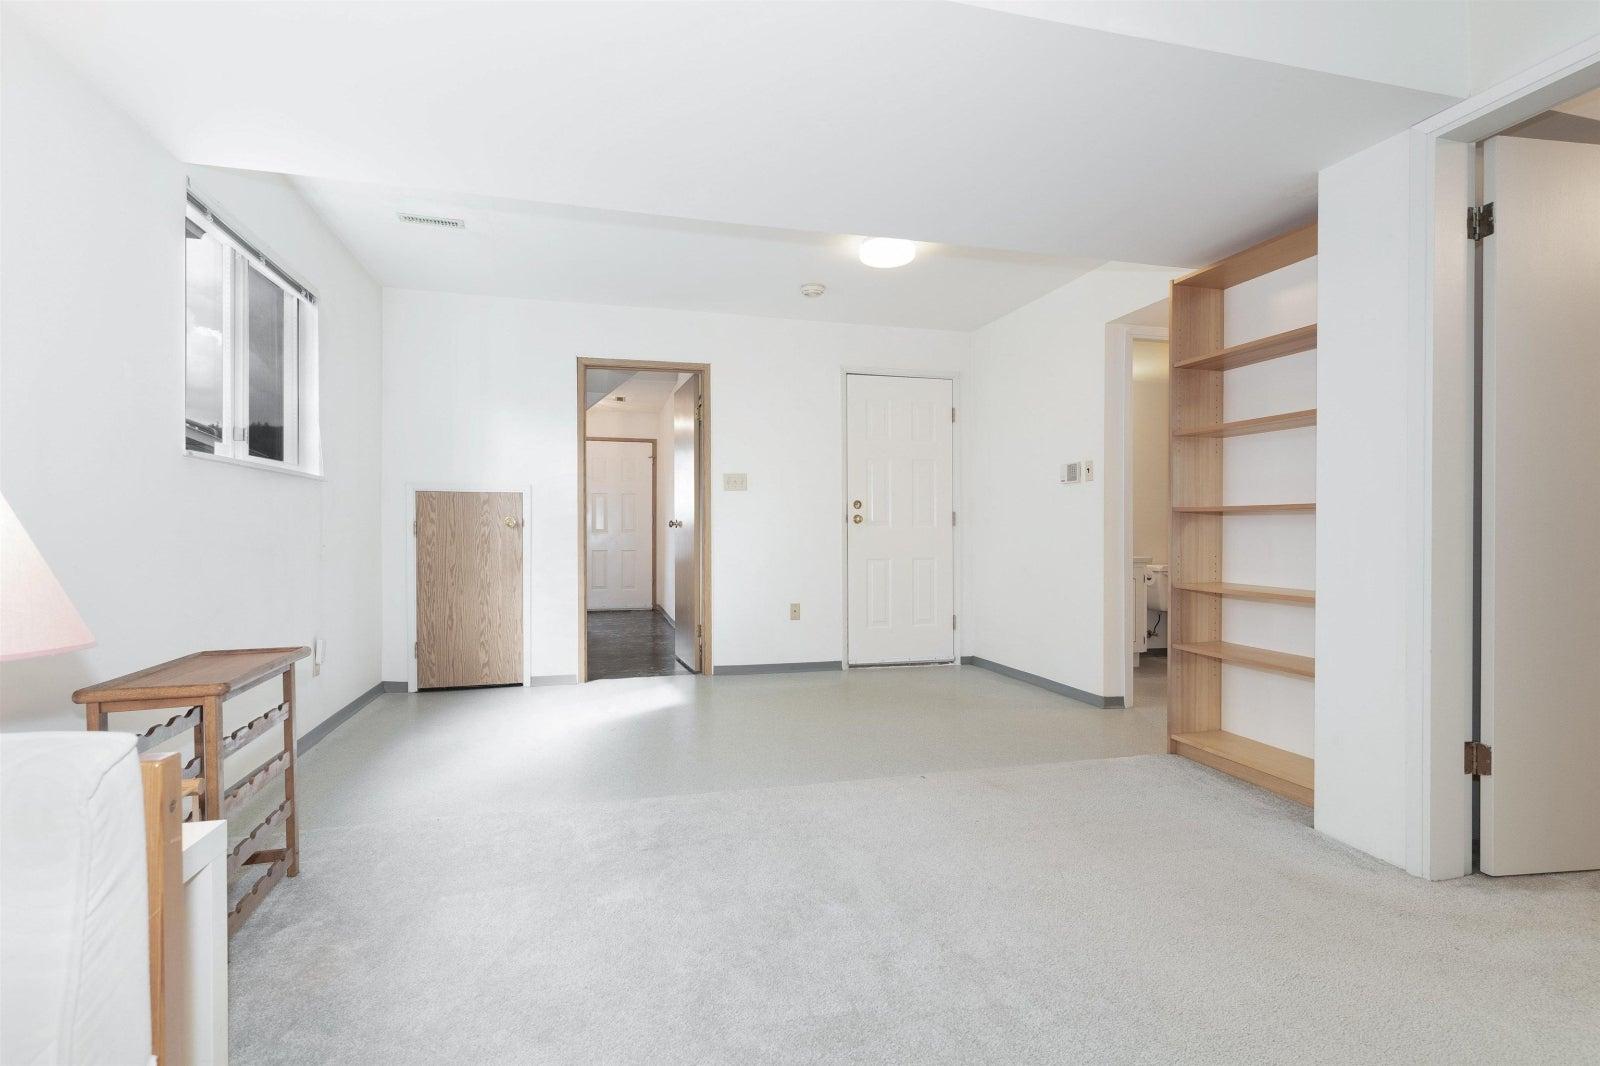 2556 RAVEN COURT - Eagle Ridge CQ House/Single Family for sale, 4 Bedrooms (R2611826) #25